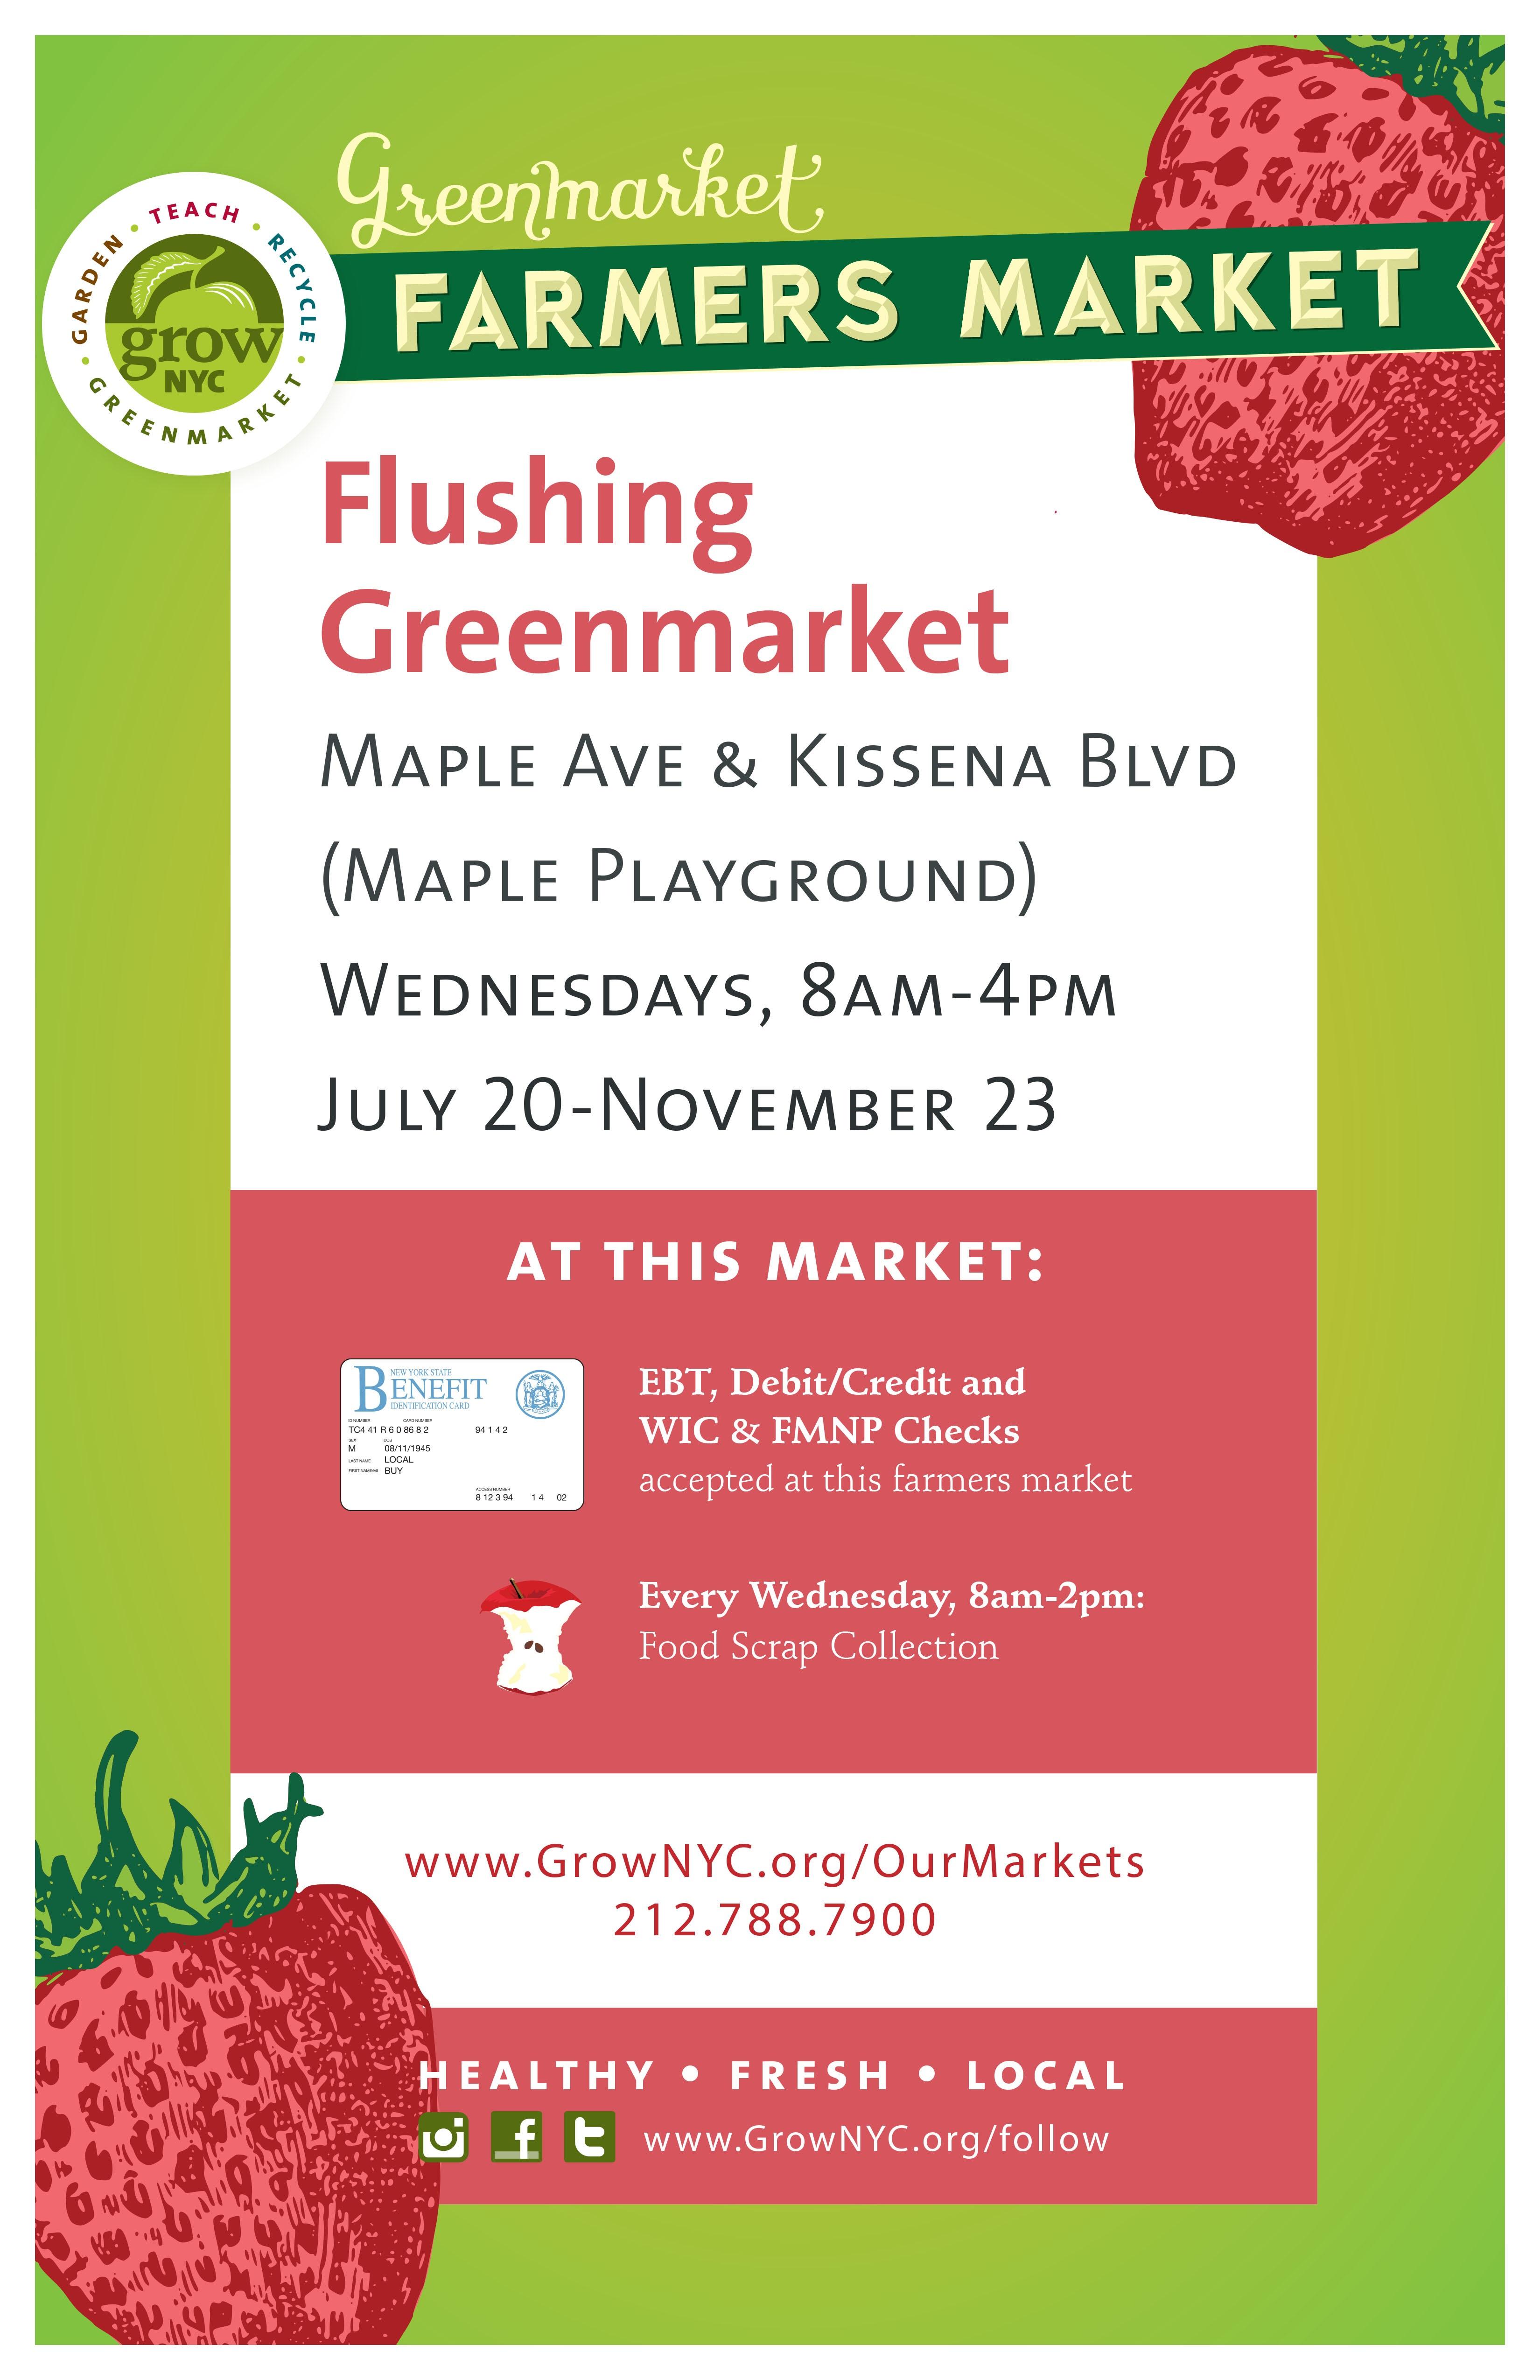 Poster_Flushing Greenmarket